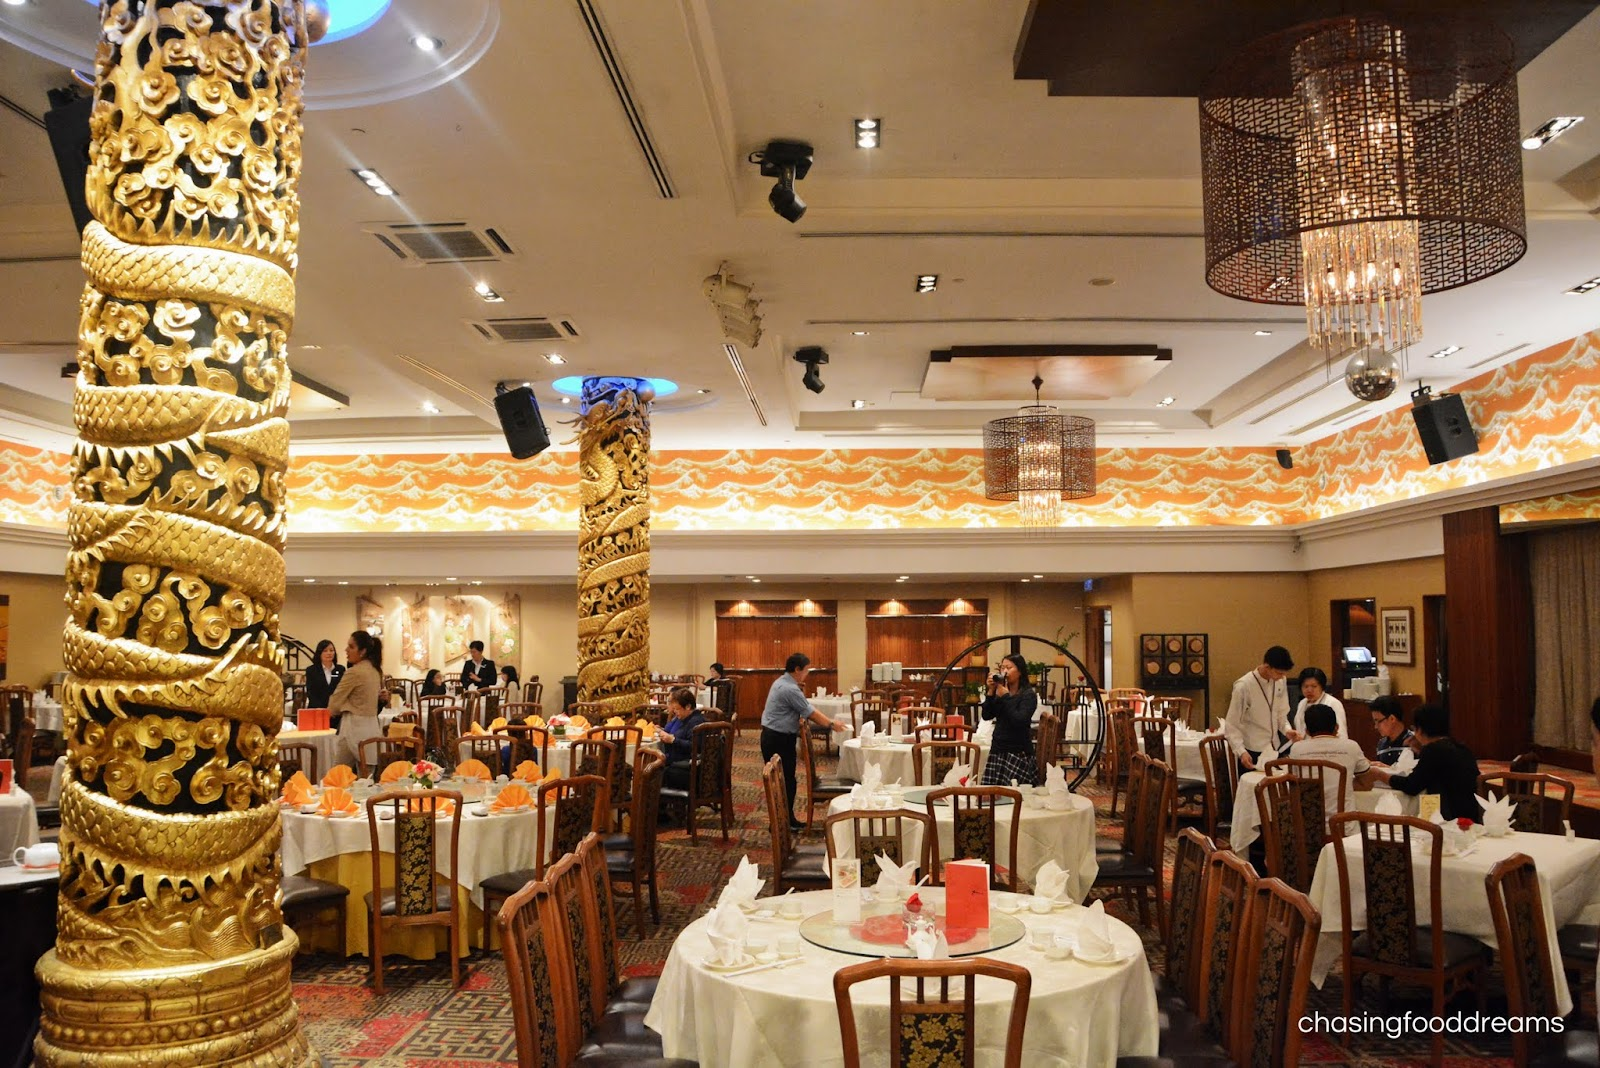 Chasing Food Dreams Xin Cuisine At Concorde Hotel Kuala Lumpur New Menu